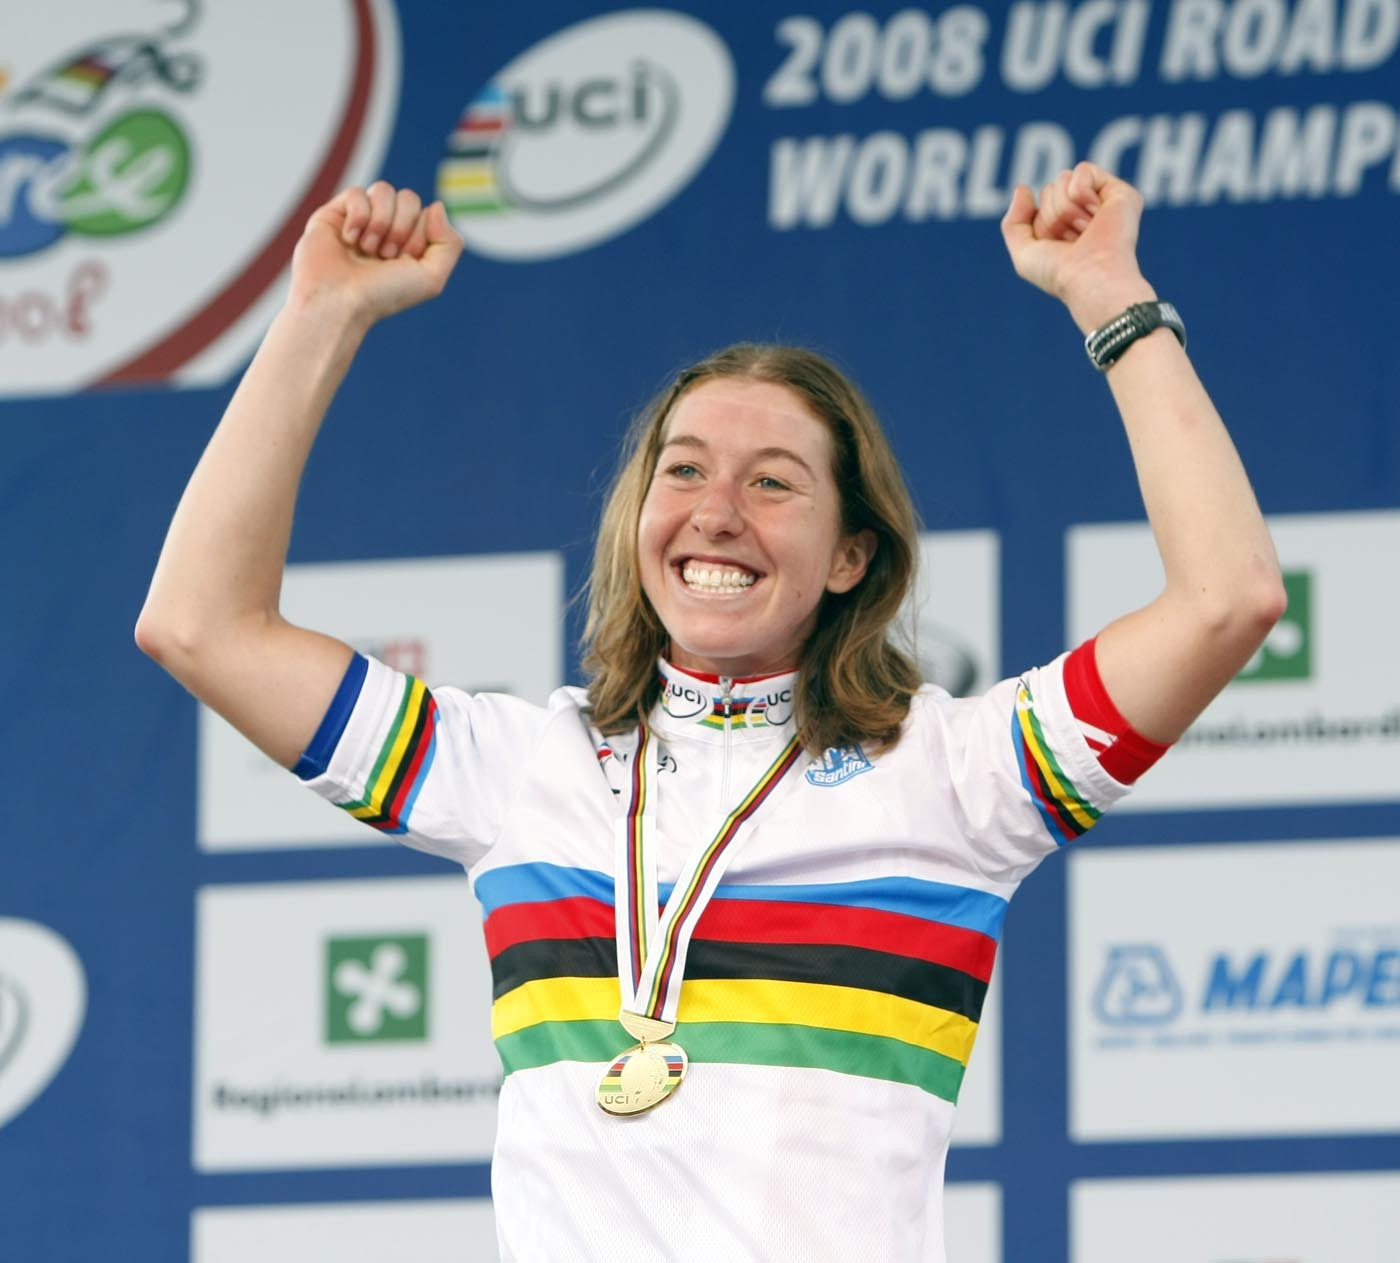 World Championships 2008